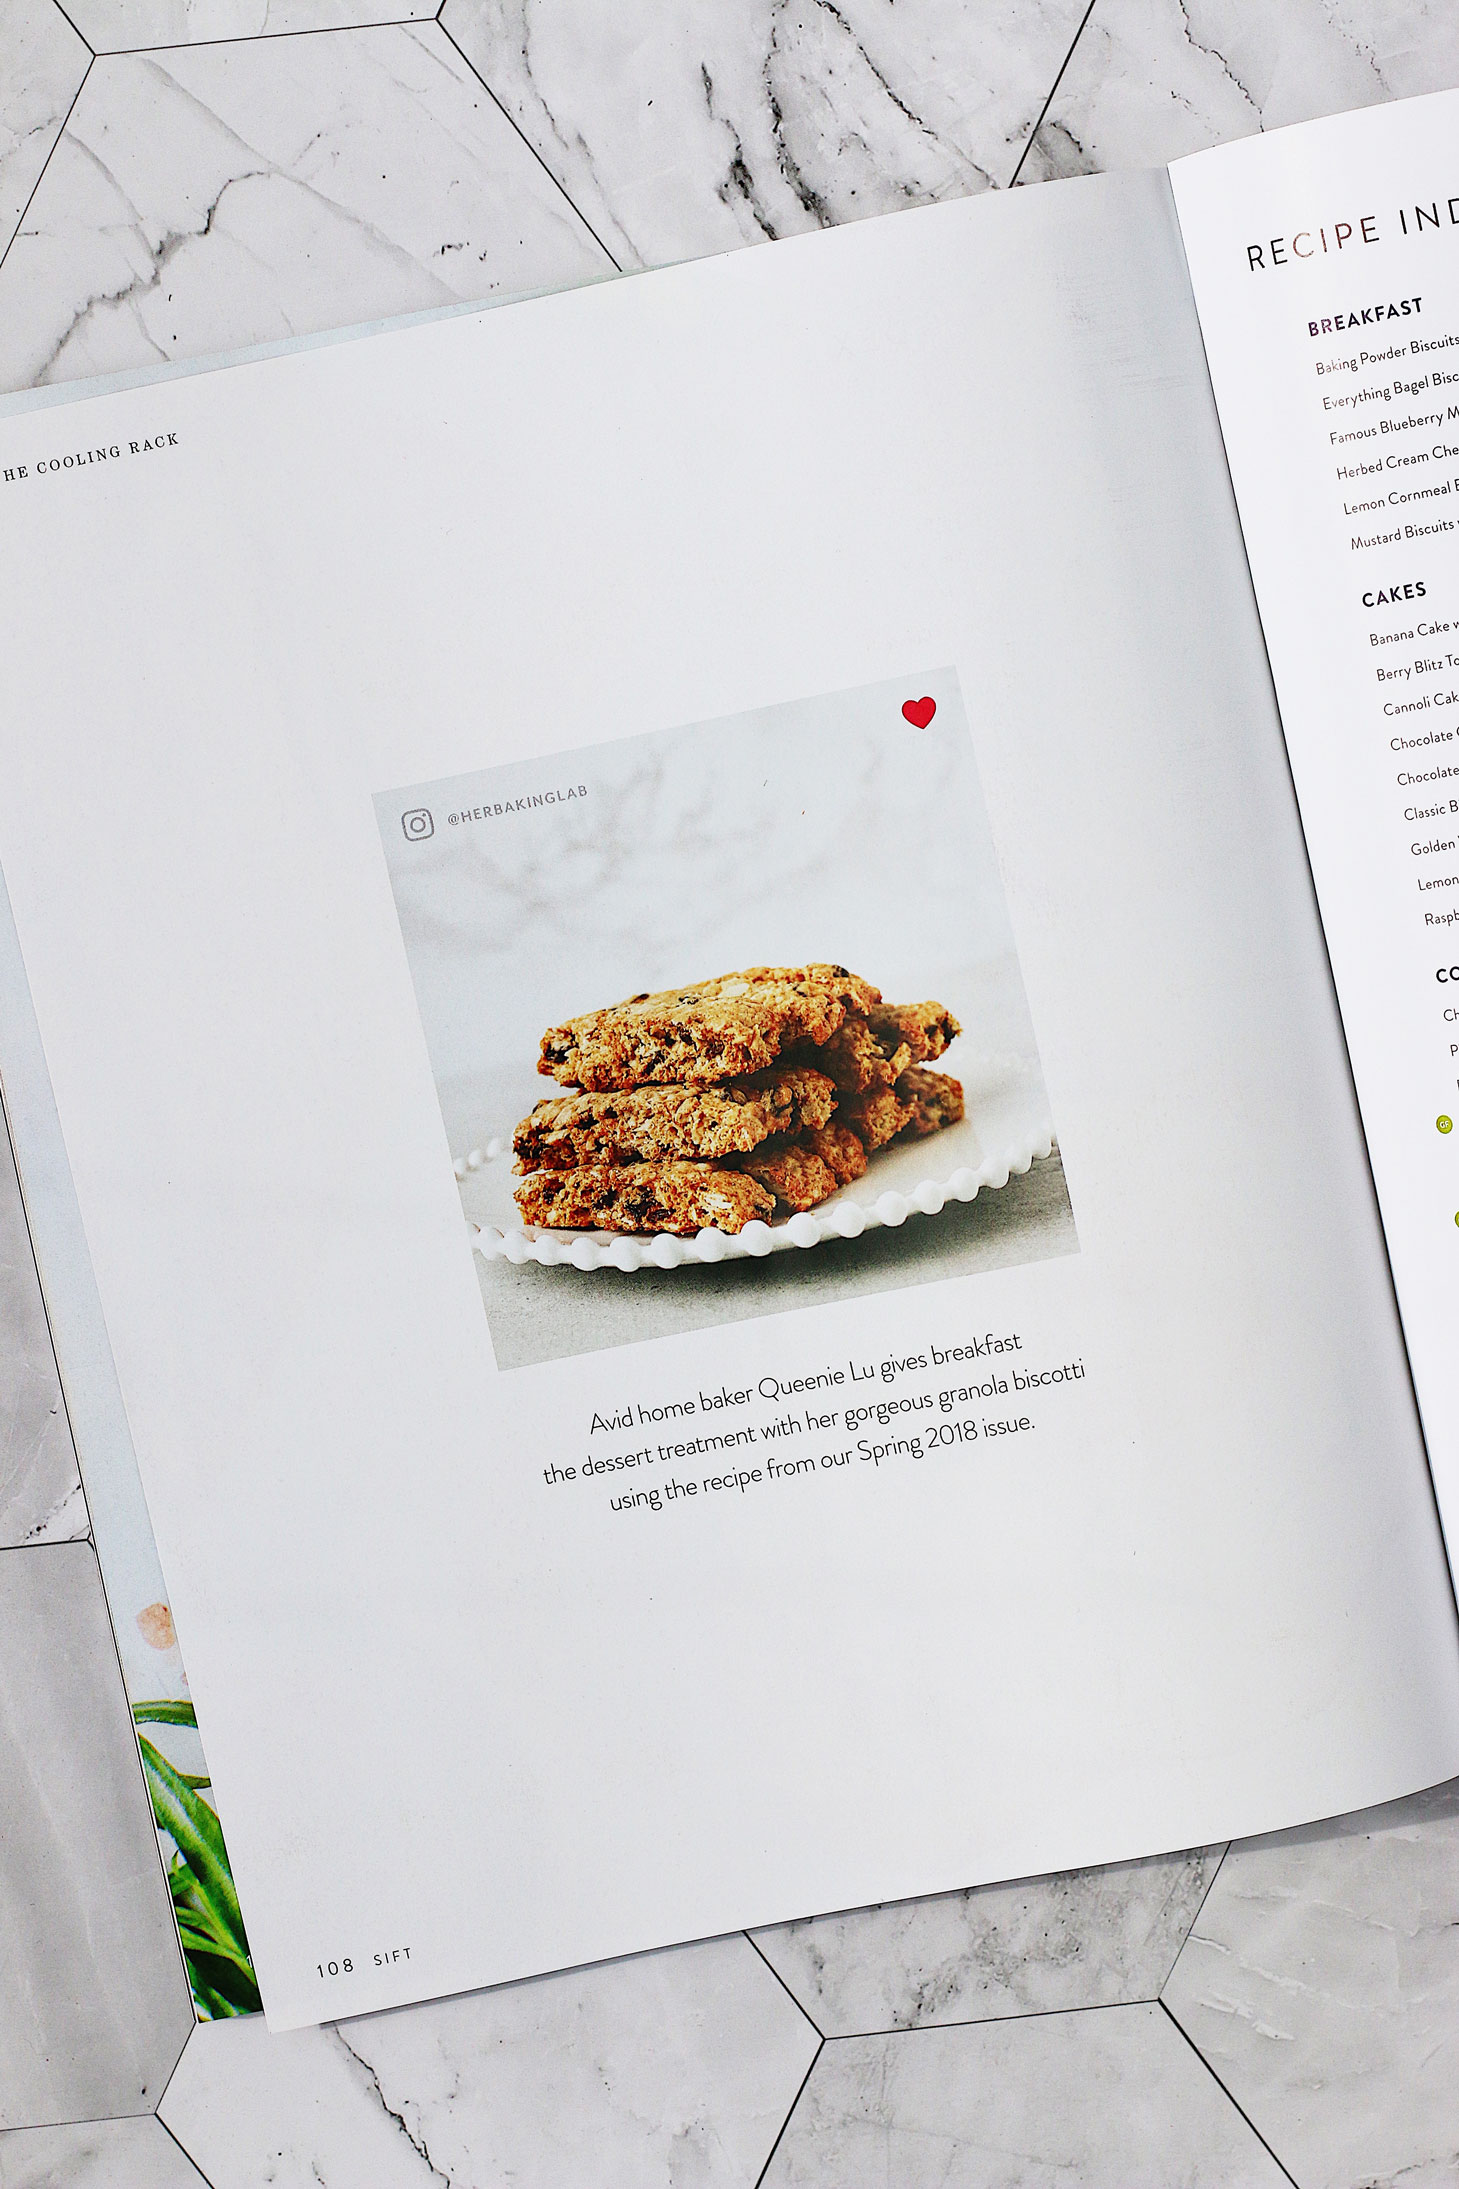 herbakinglab-granola-biscotti-picture-in-Sift-Magazine-Spring-Issue-2019